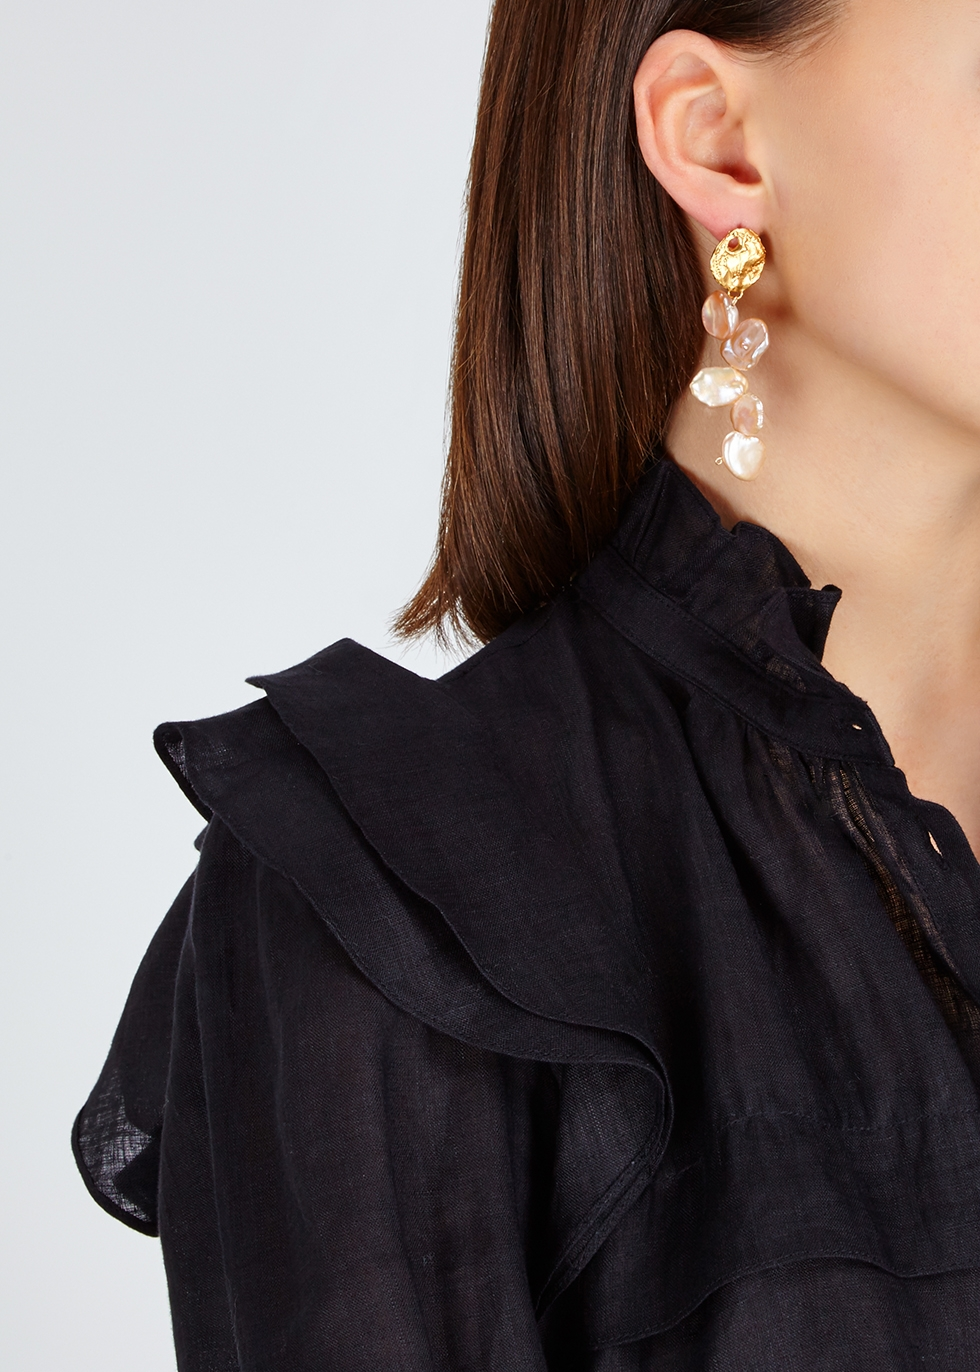 Le Jetée gold-plated drop earrings - Alighieri